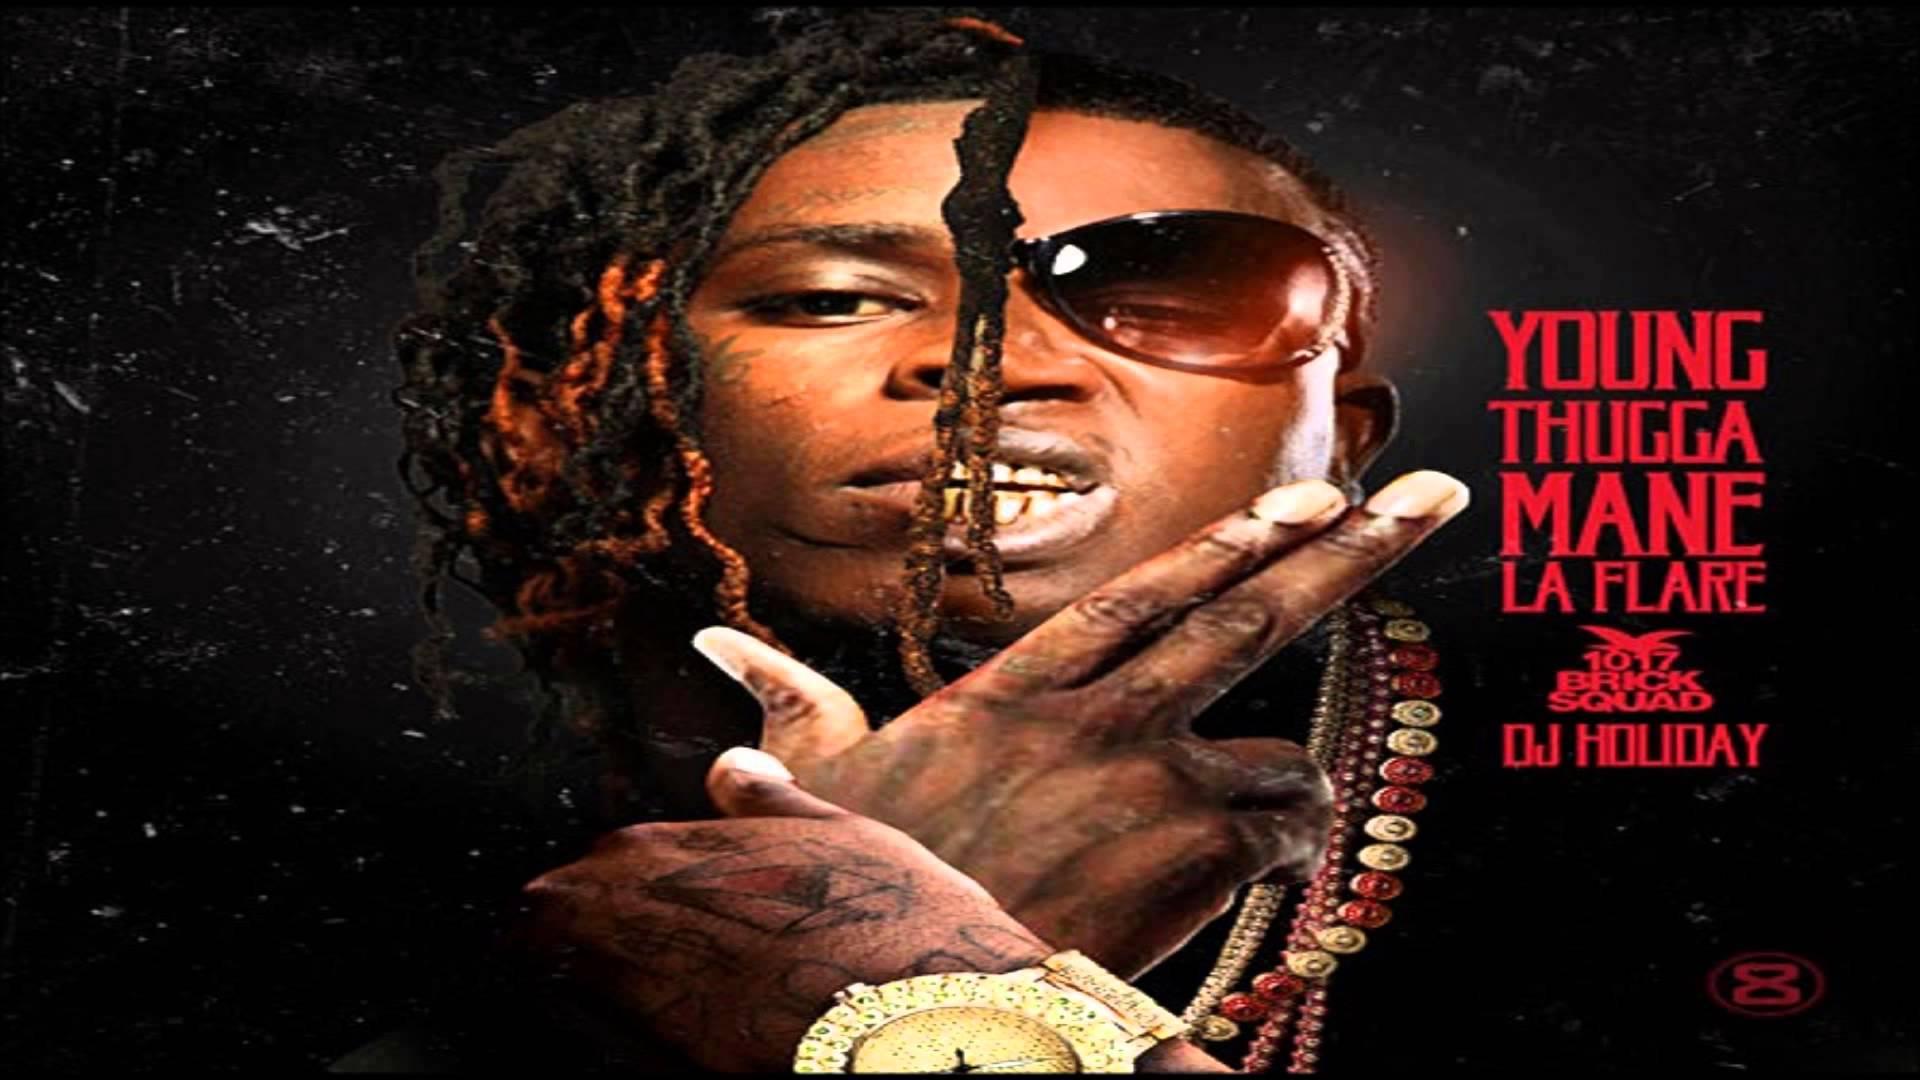 Gucci Mane x Young Thug   Out My Biz 1920x1080